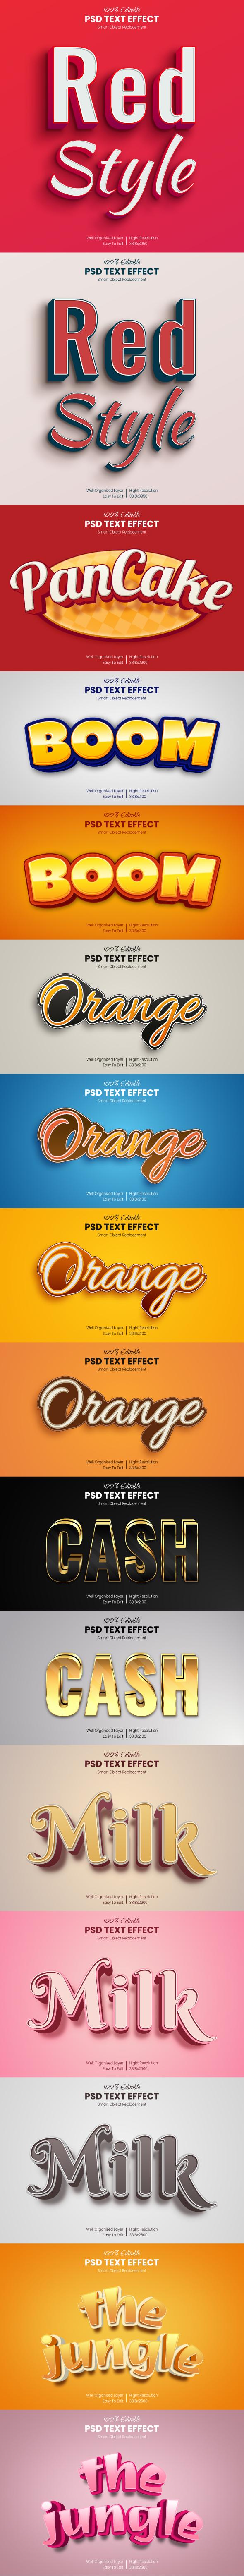 40 Luxury & Cartoon Photoshop Text Effects - Golden & Comic Styles - 1